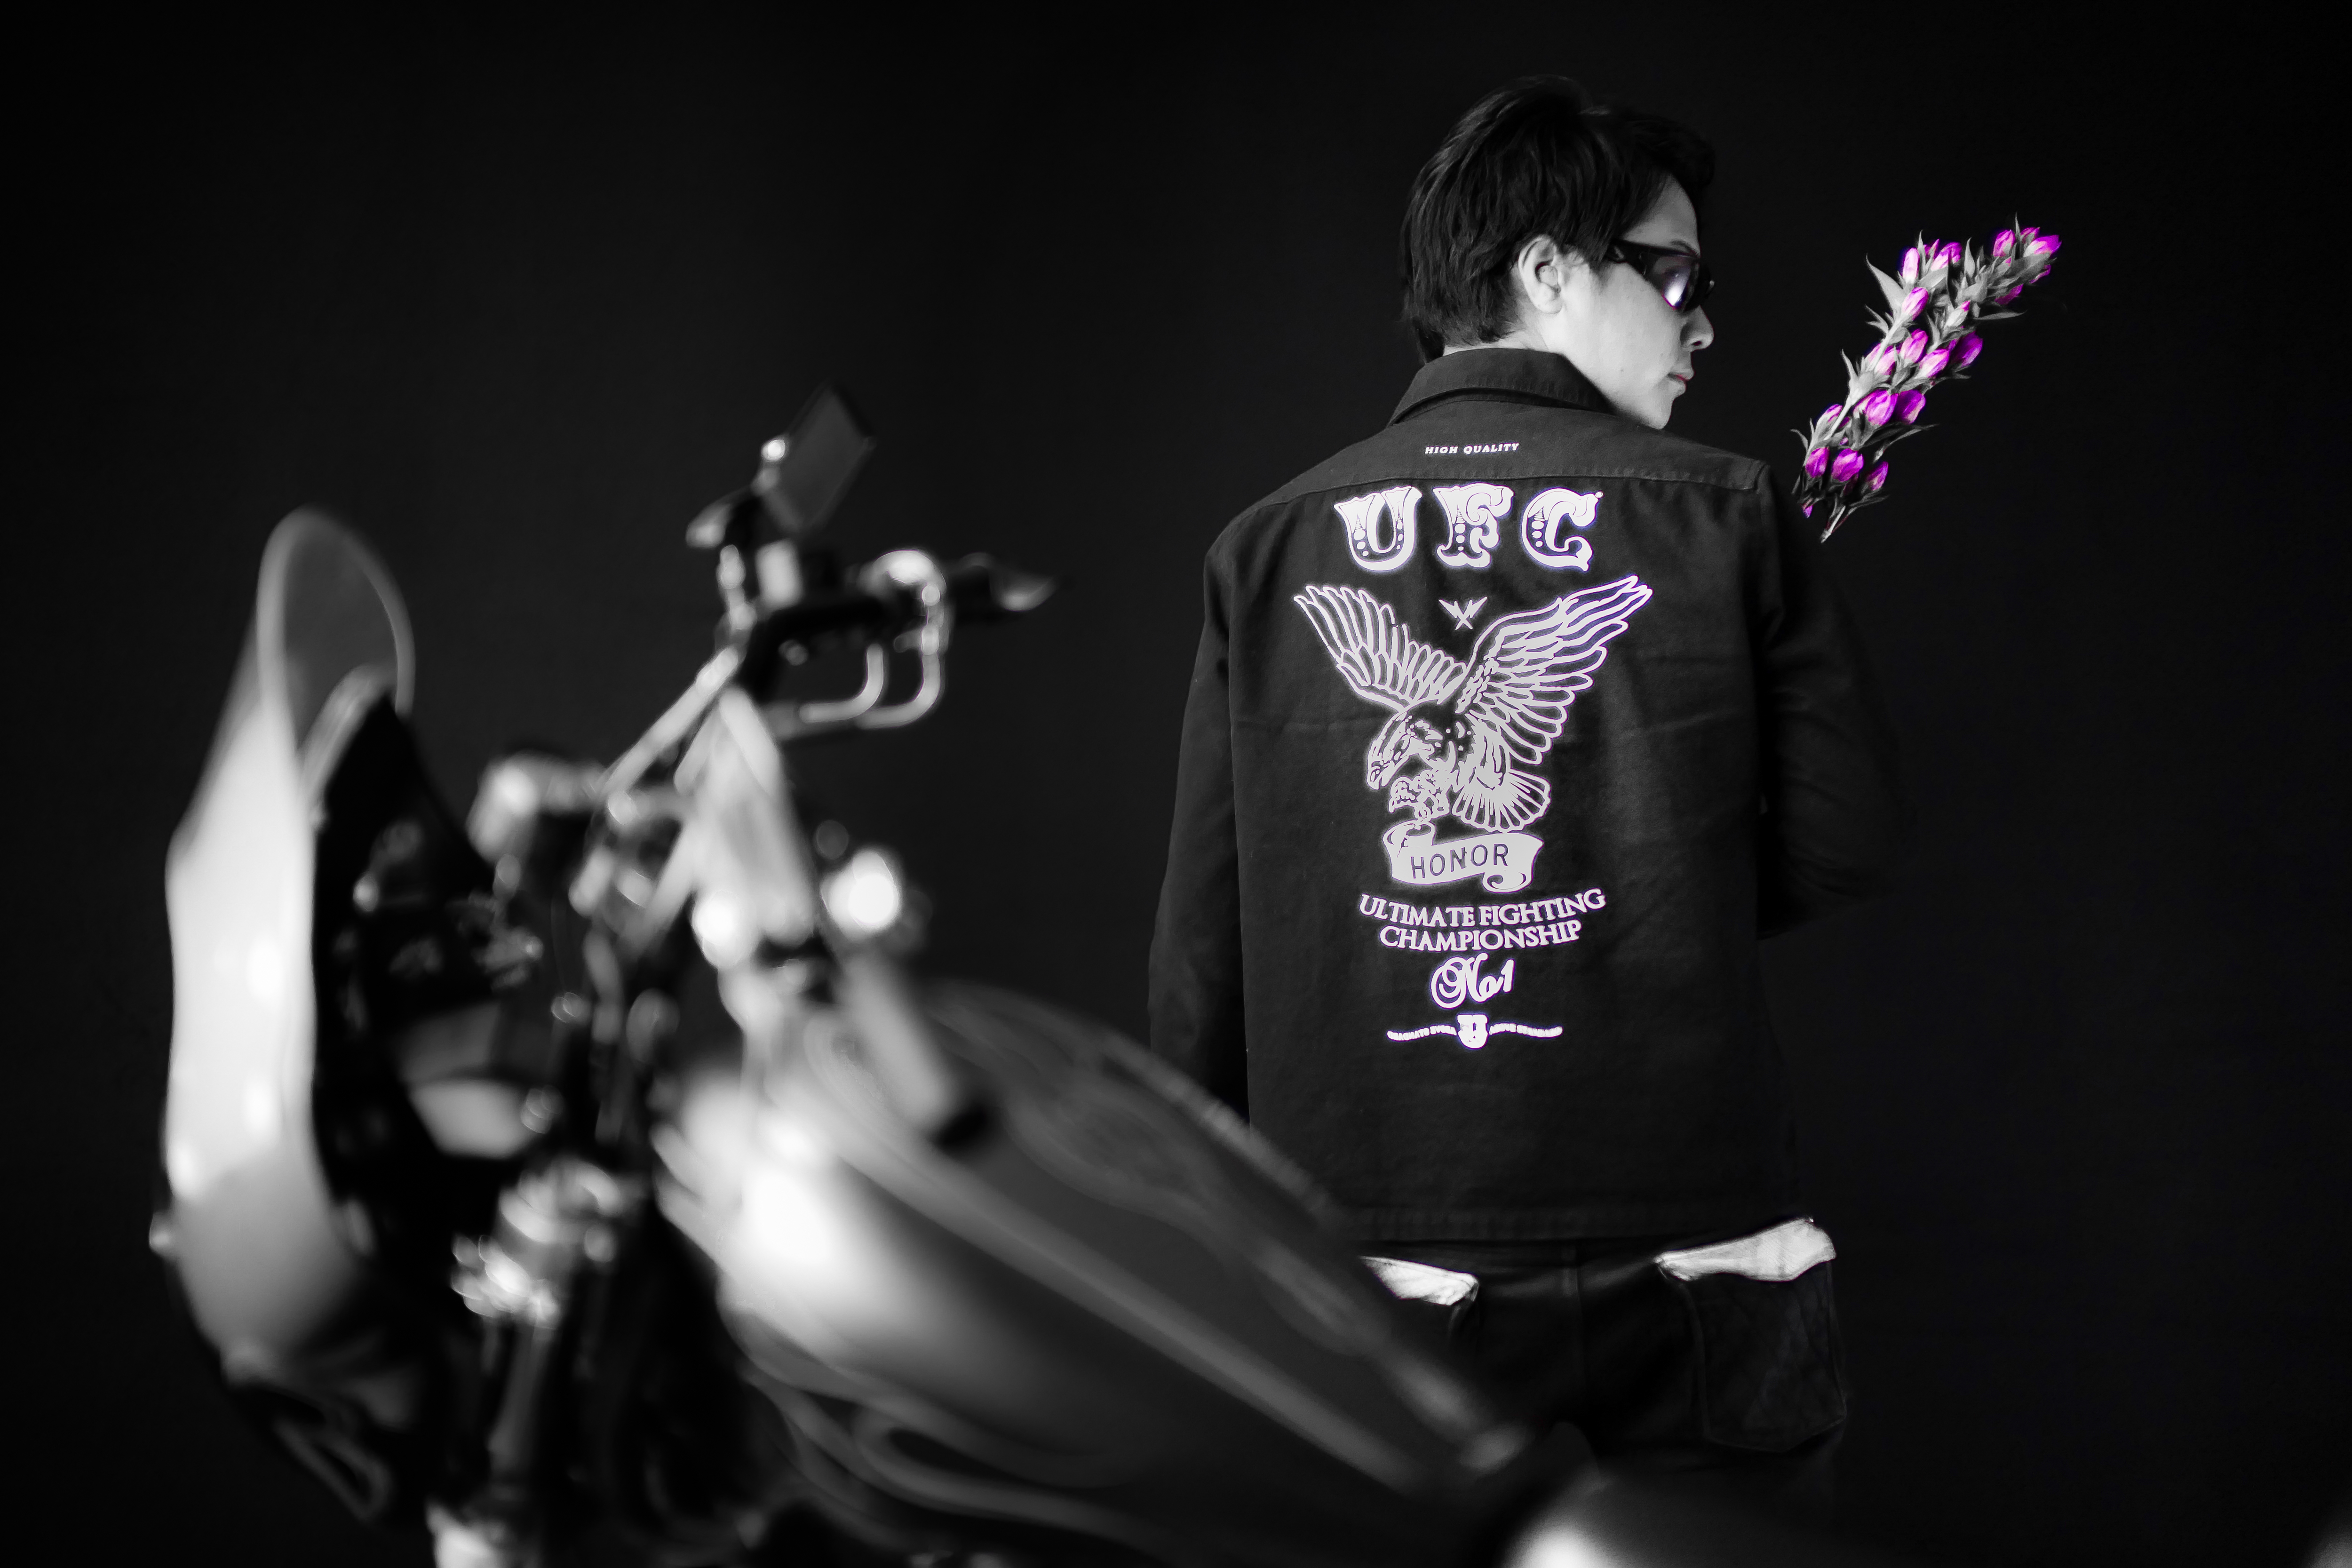 2017.11/26:B.L.F GUYS PHOTO / Nero君 Part-2 13